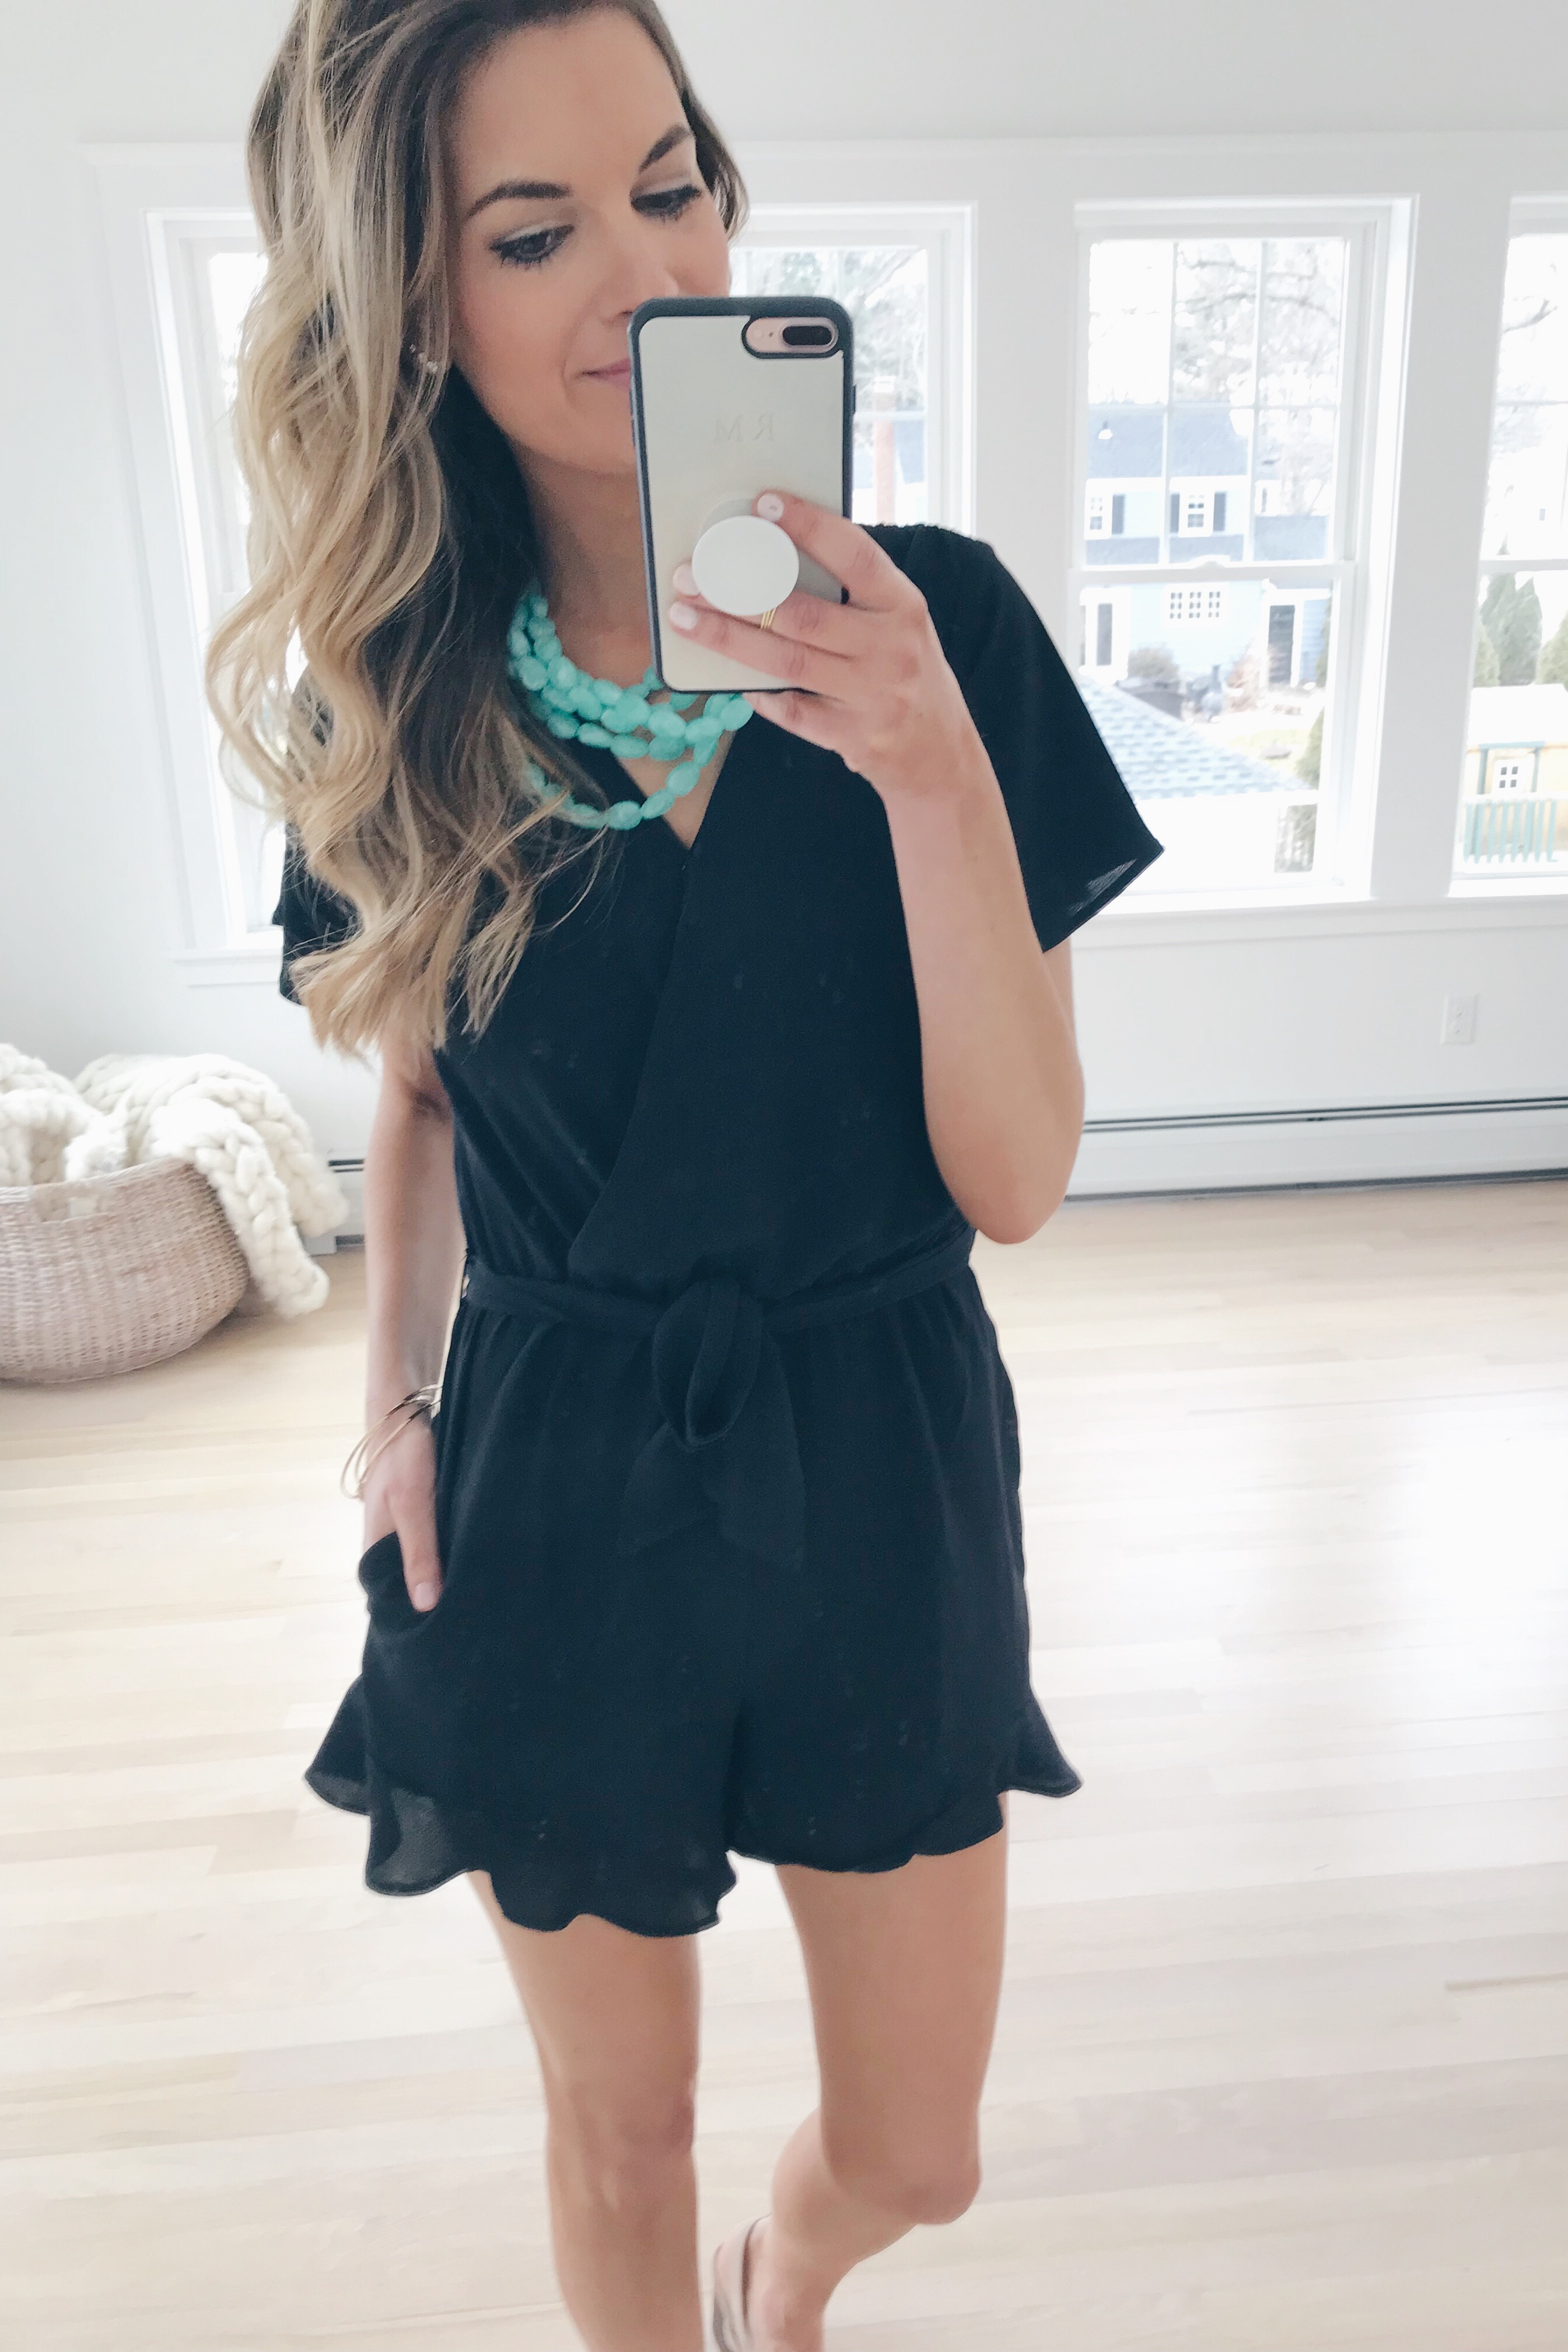 resort wear 2019 - gibson black ruffle hem romper on pinterestingplans blog